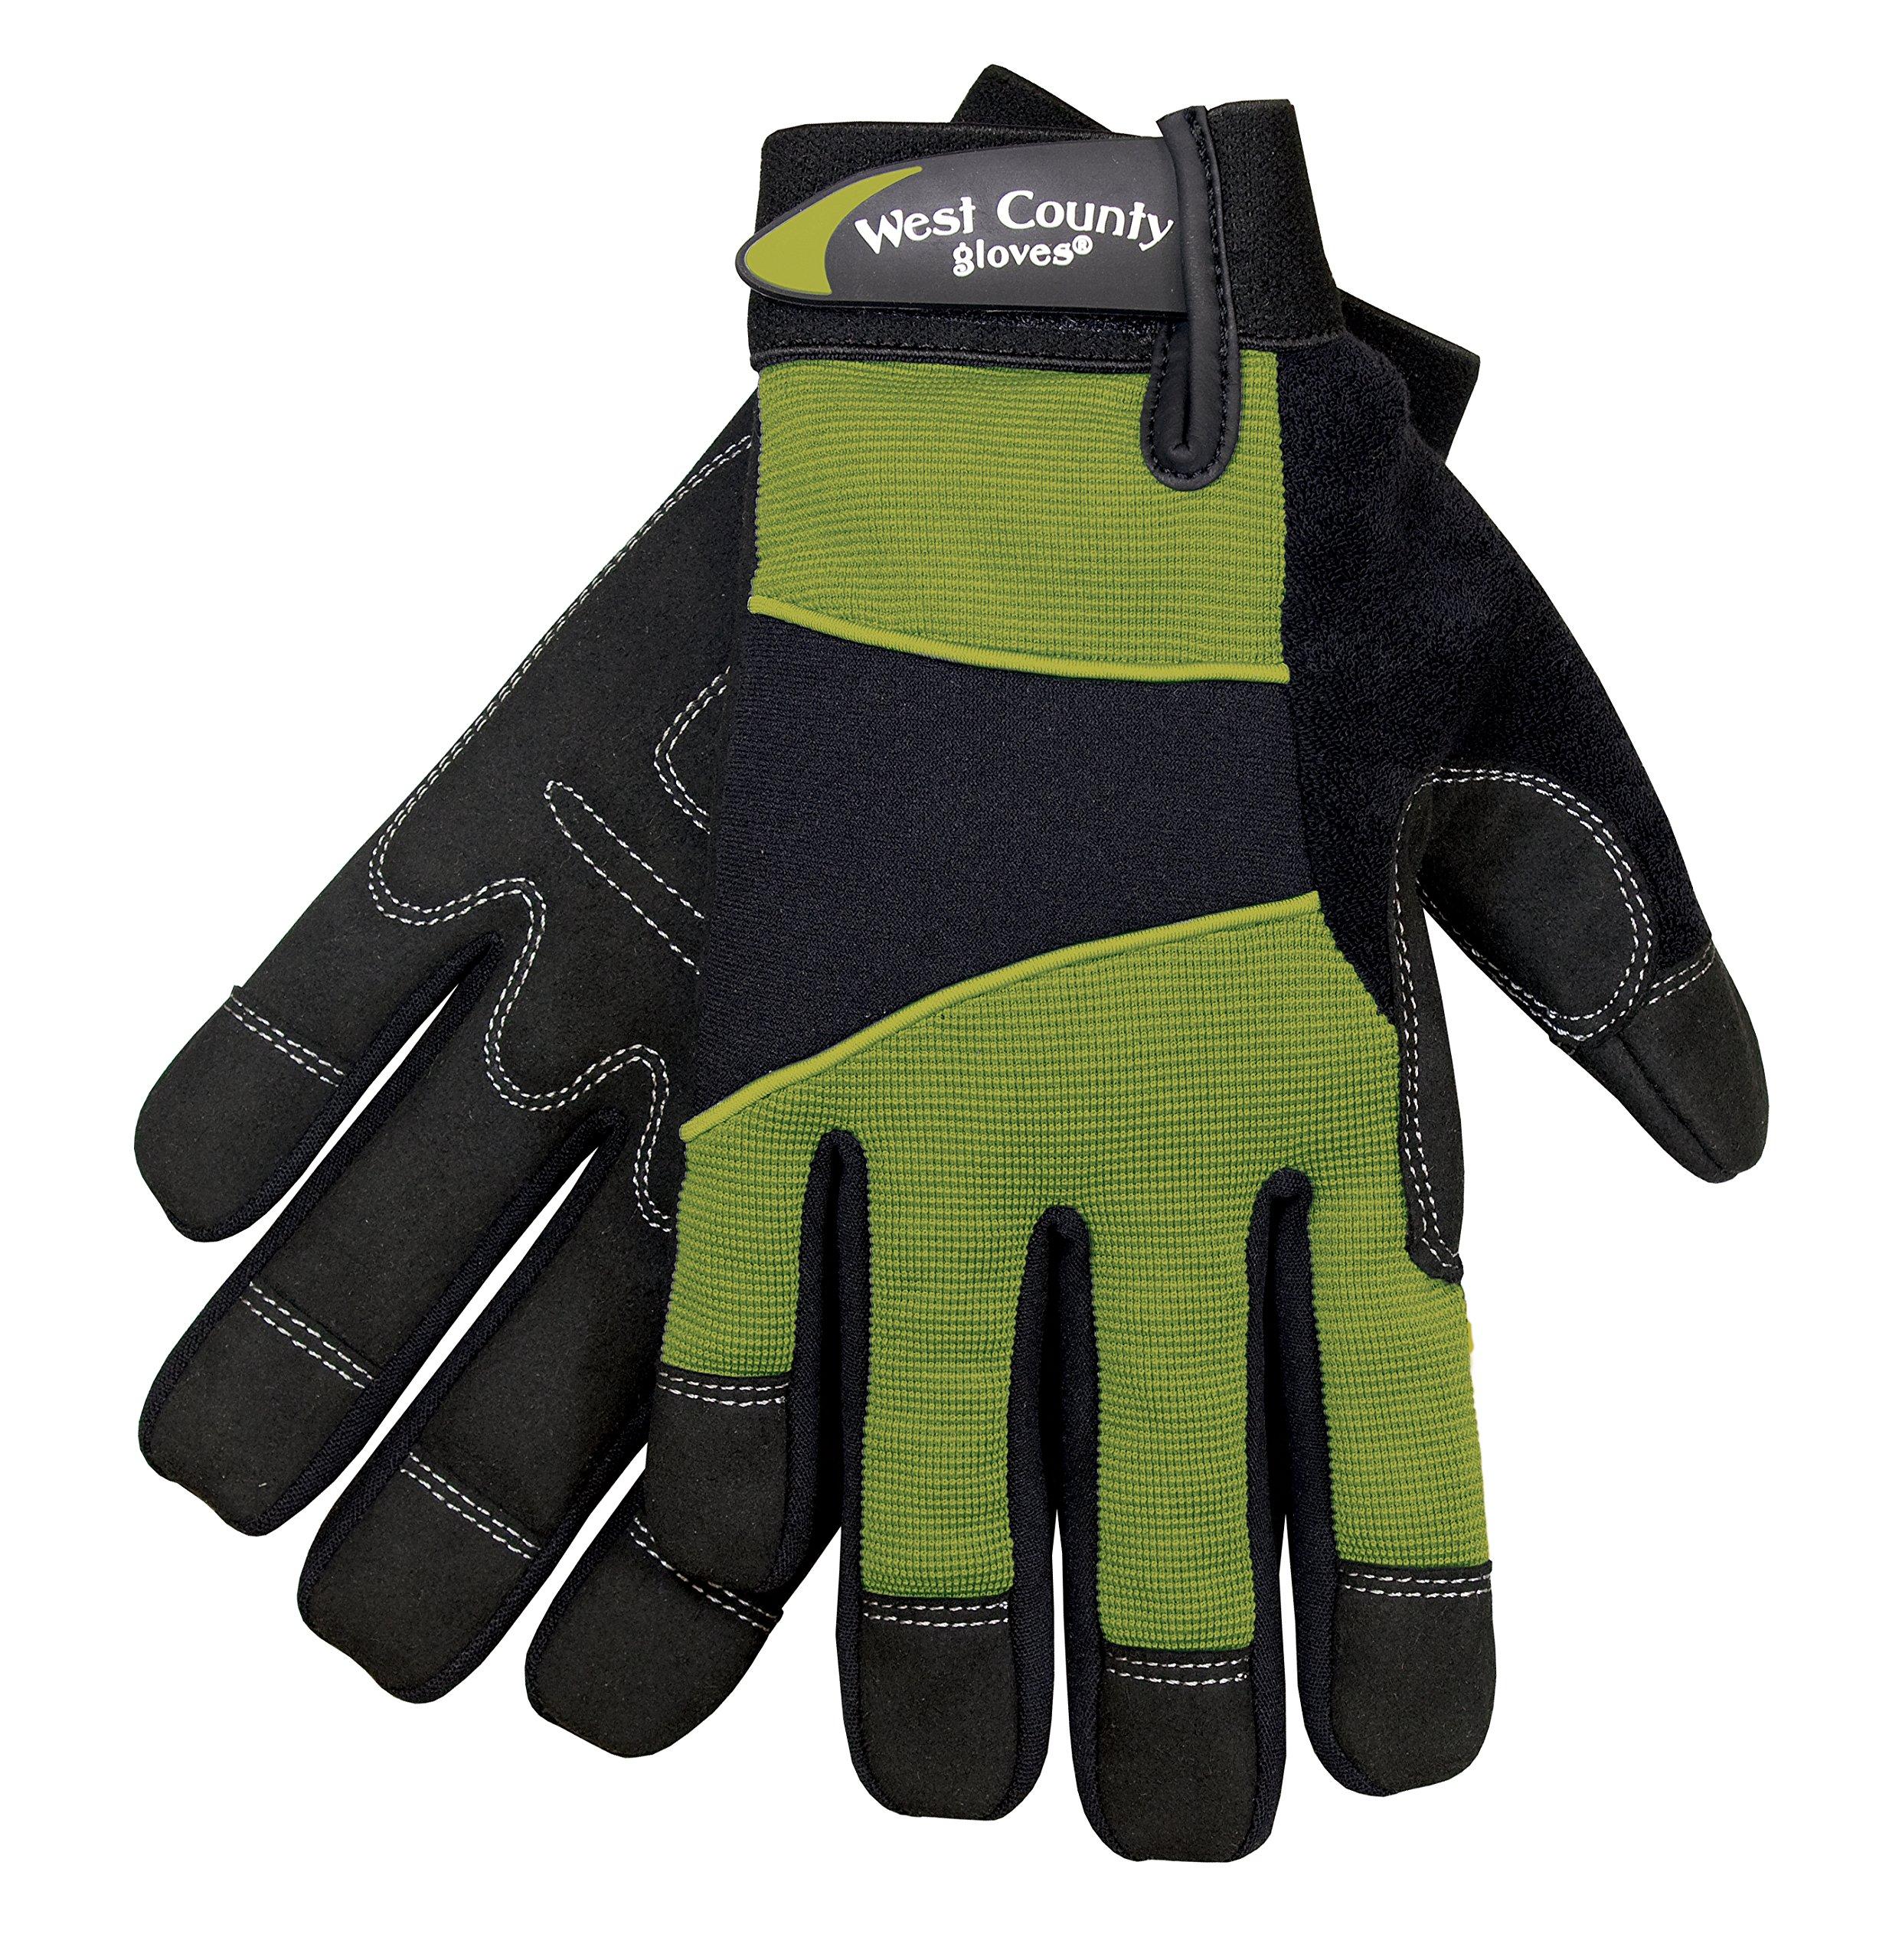 West County Gardener 012S/L Women's Work Glove, Large, Stem